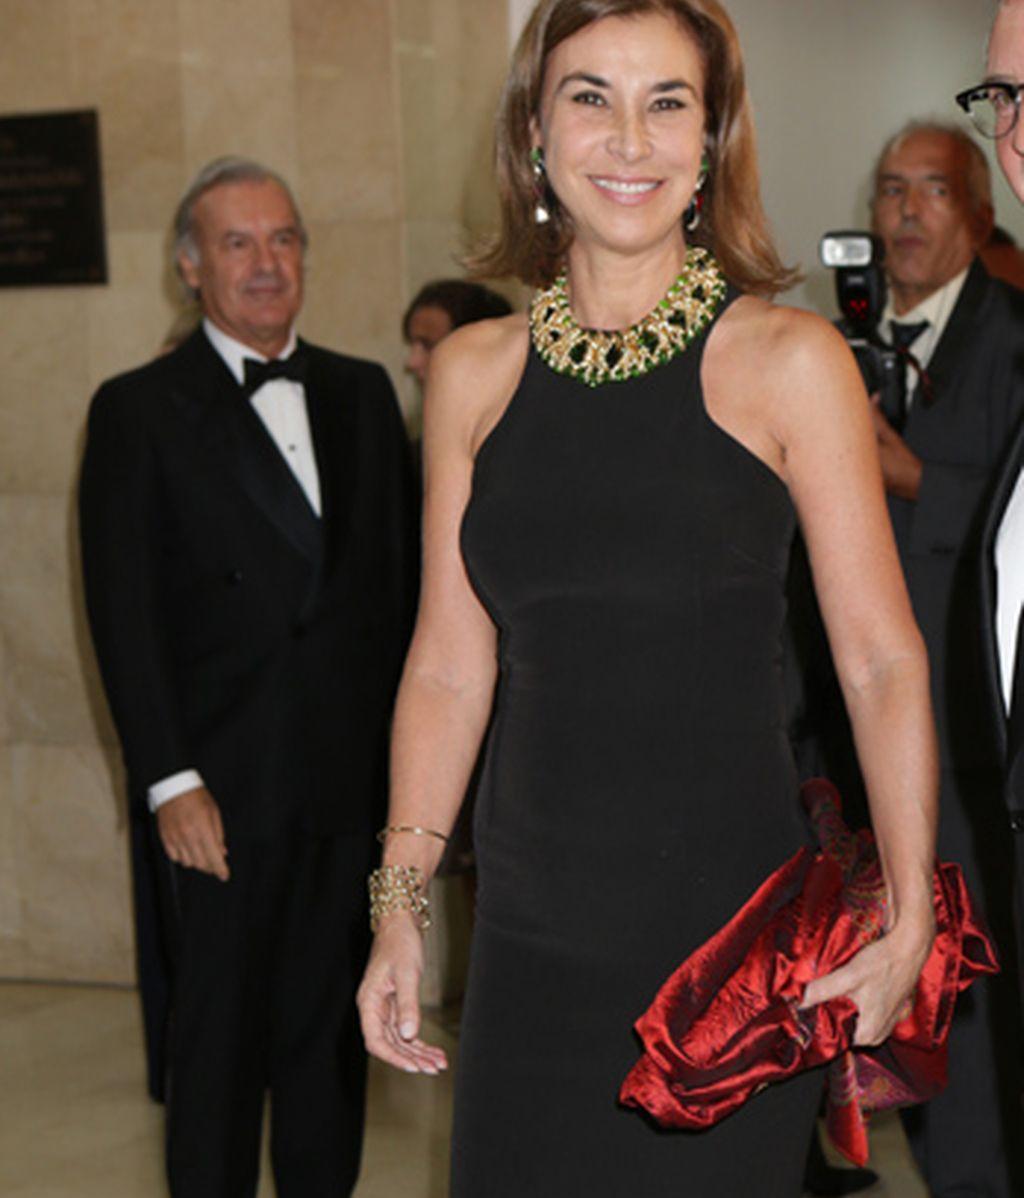 La escritora Carmen Posadas, viuda de Mariano Rubio